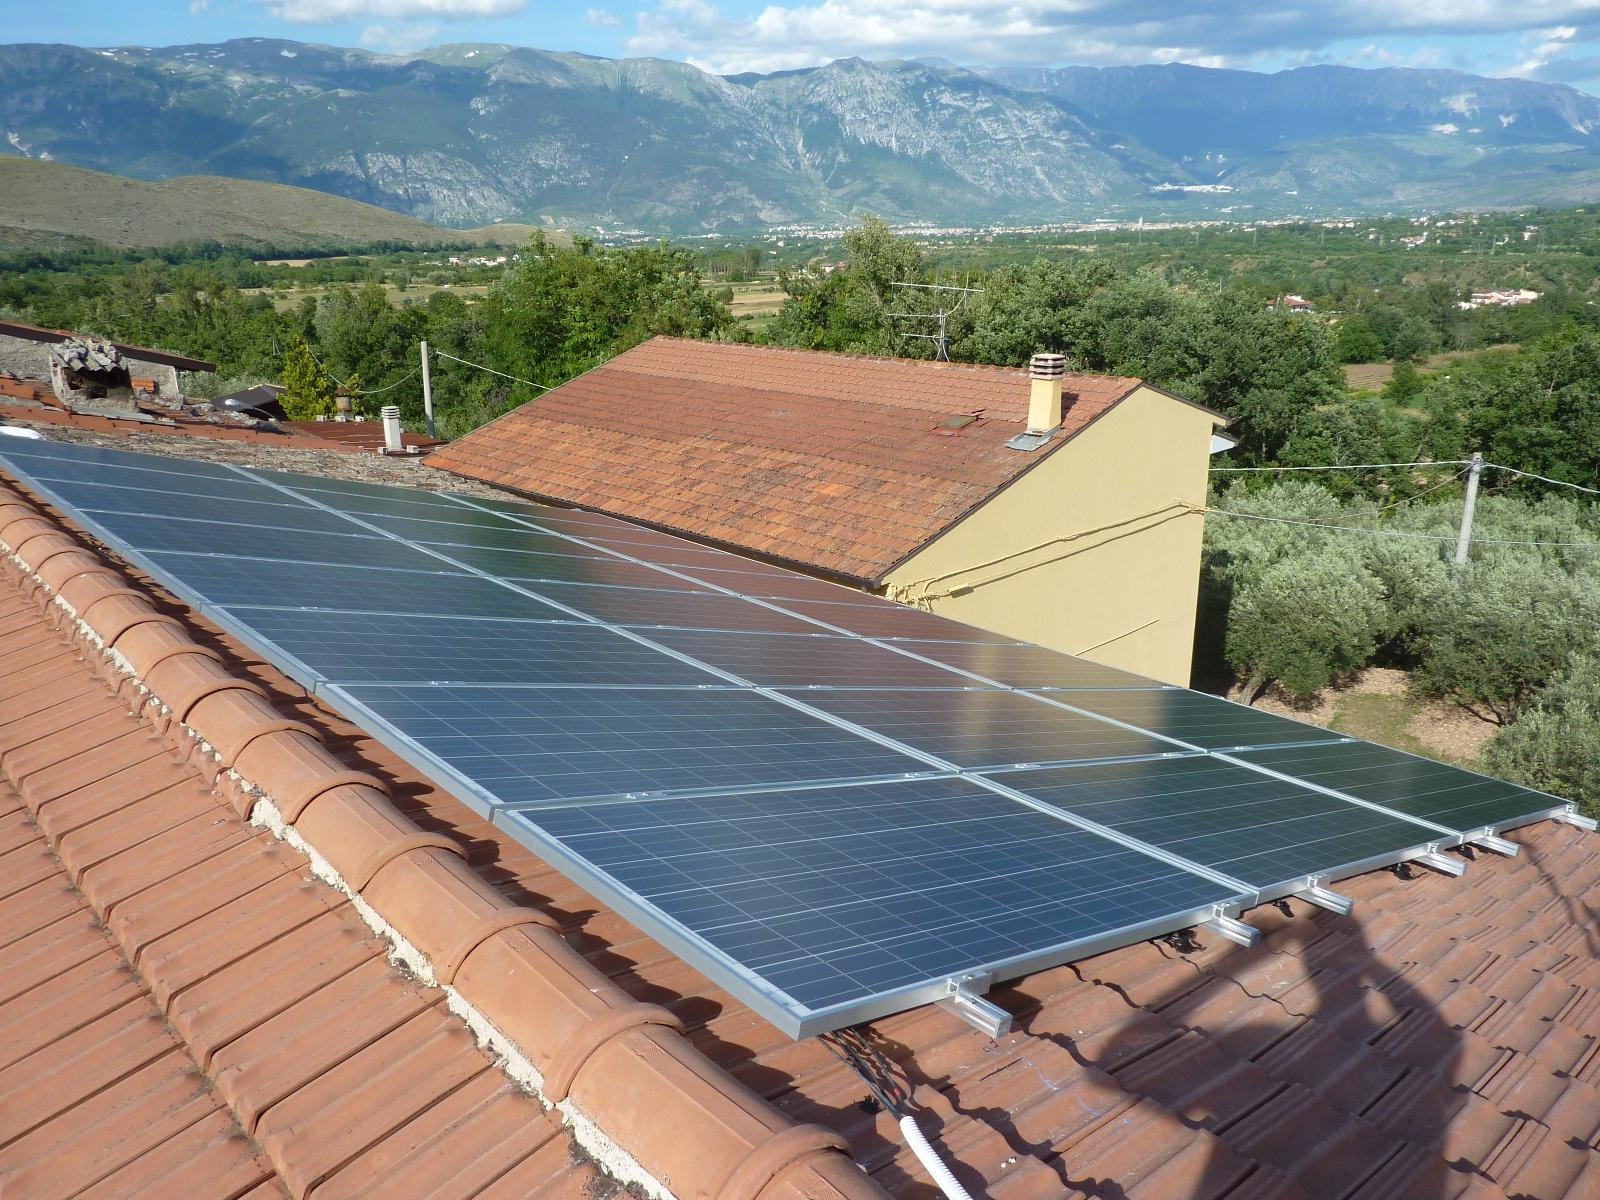 Impianto fotovoltaico a Bugnara (6kW).